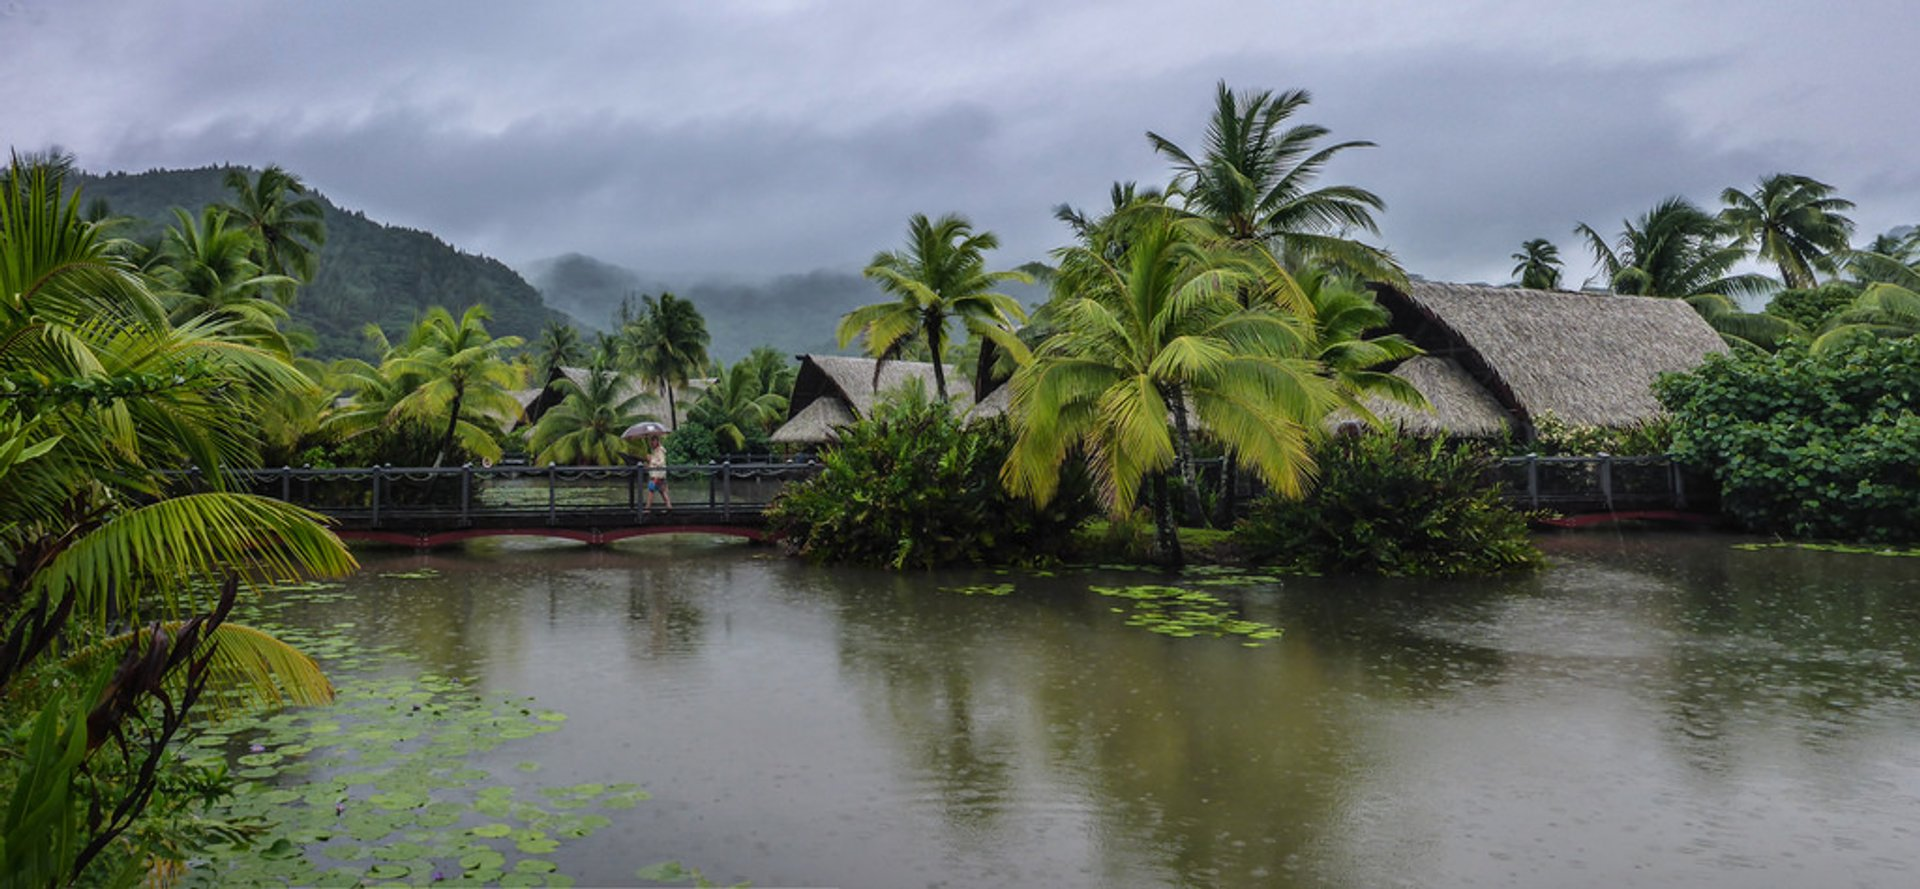 Rainy Season (Summer) in Tahiti 2020 - Best Time